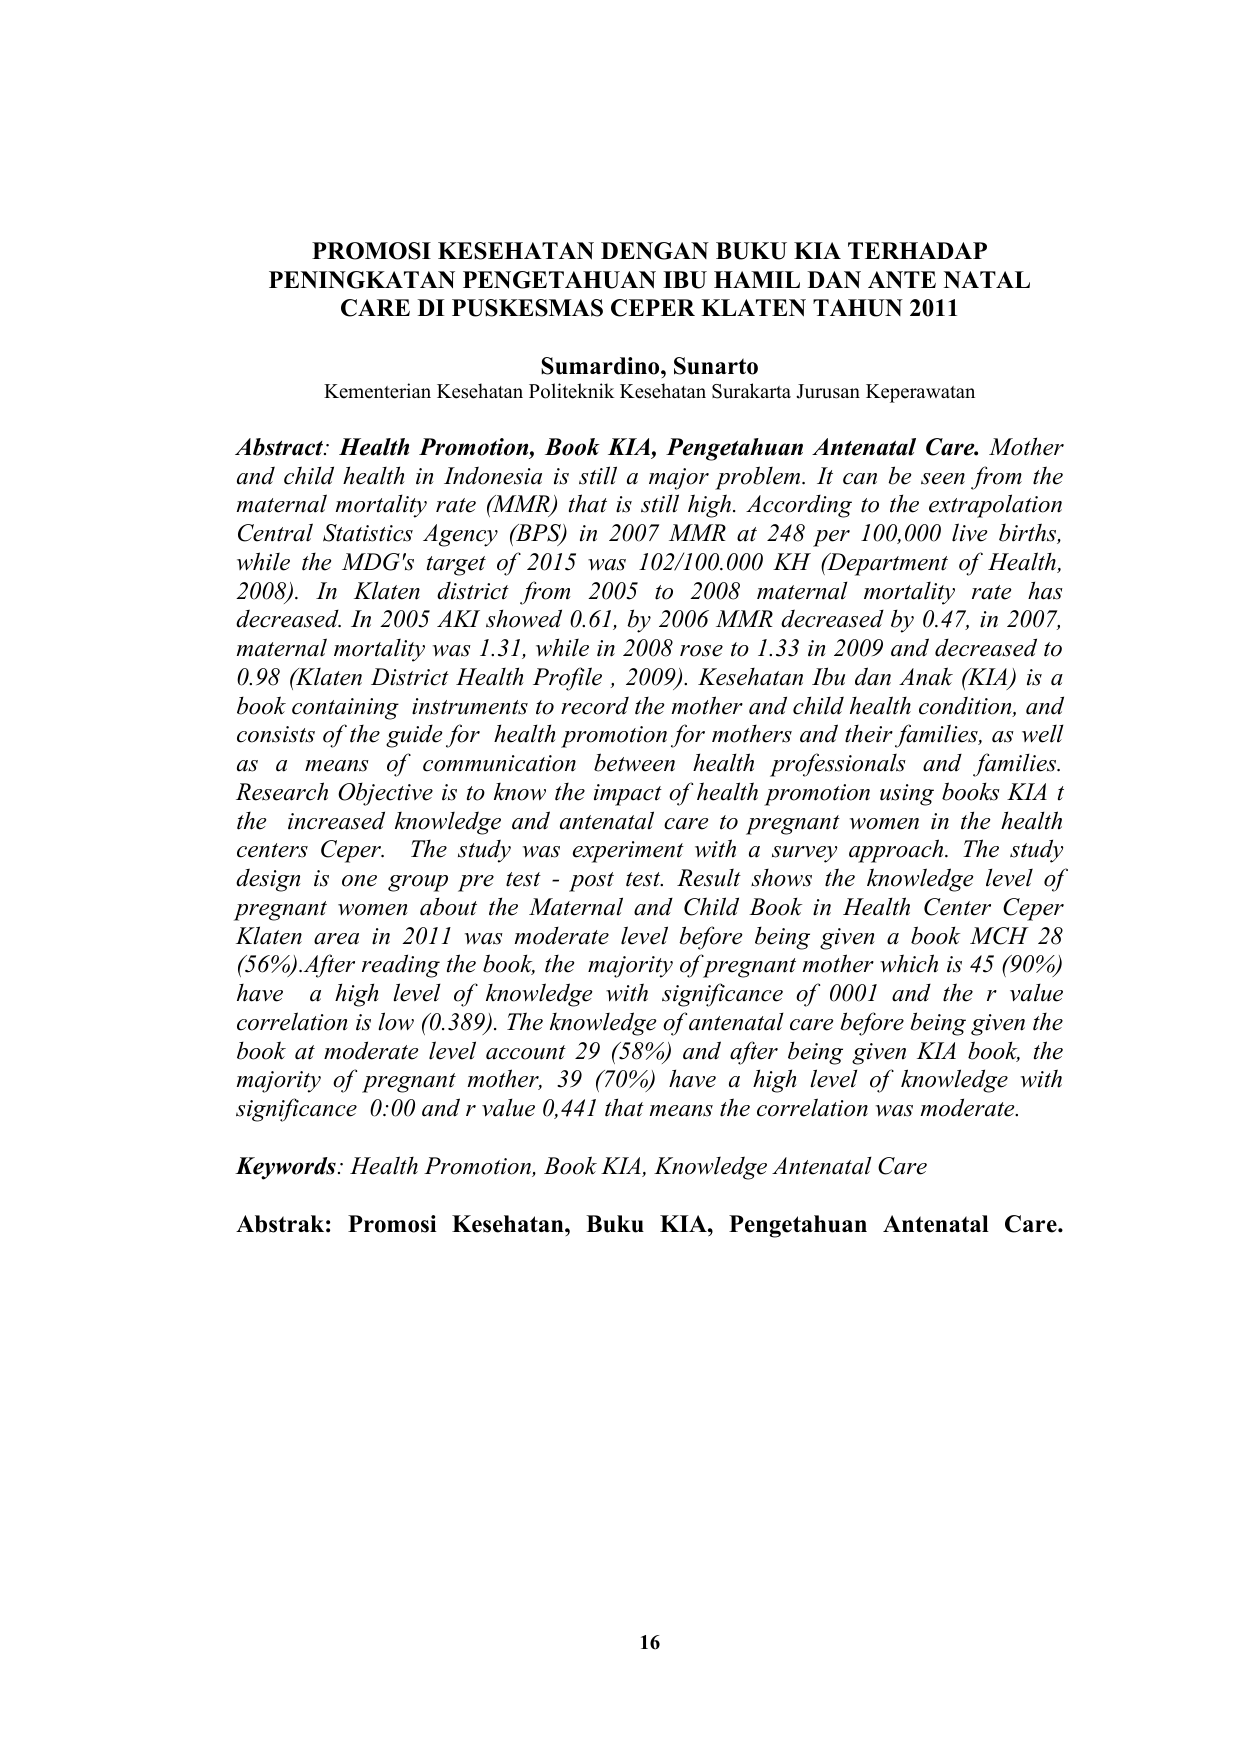 Unduh File Pdf Ini E Jurnal Politeknik Kesehatan Surakarta